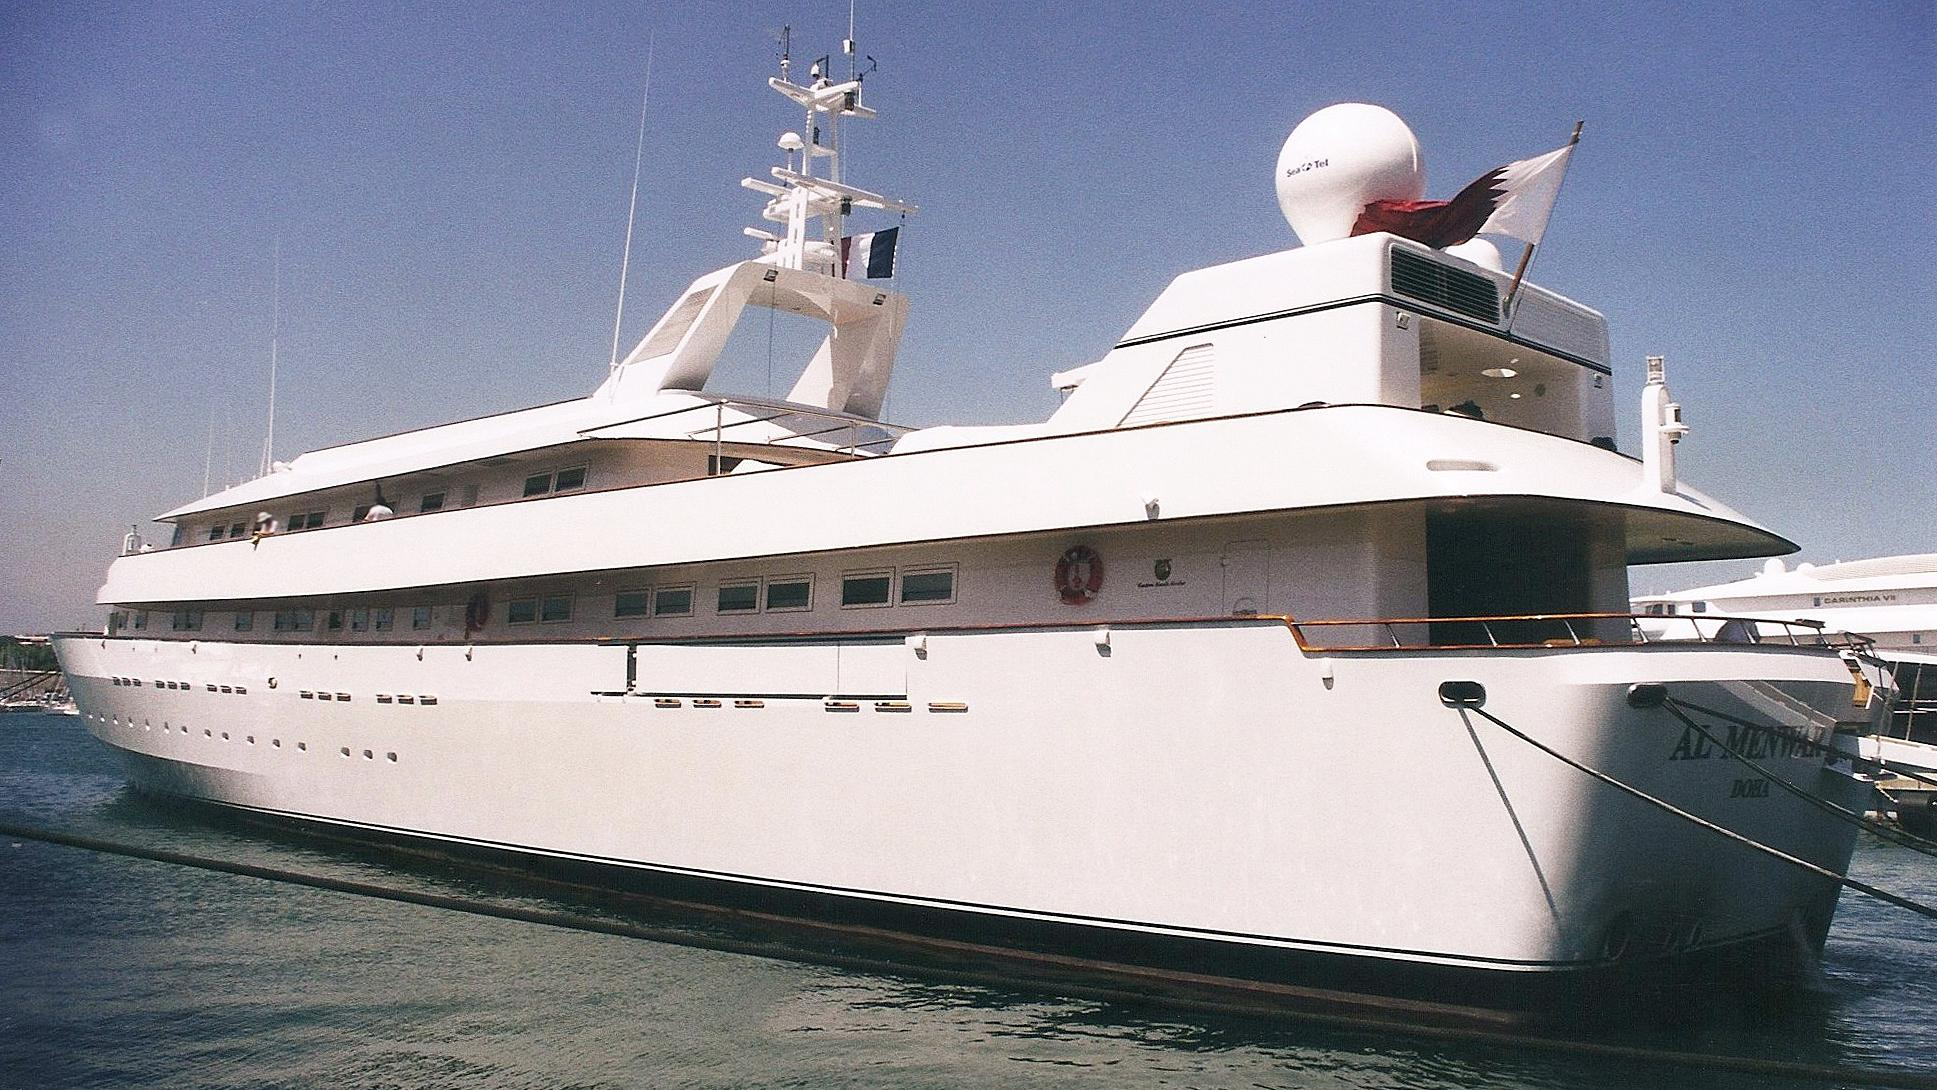 yaakun-motor-yacht-nicolini-1987-65m-moored-before-refit